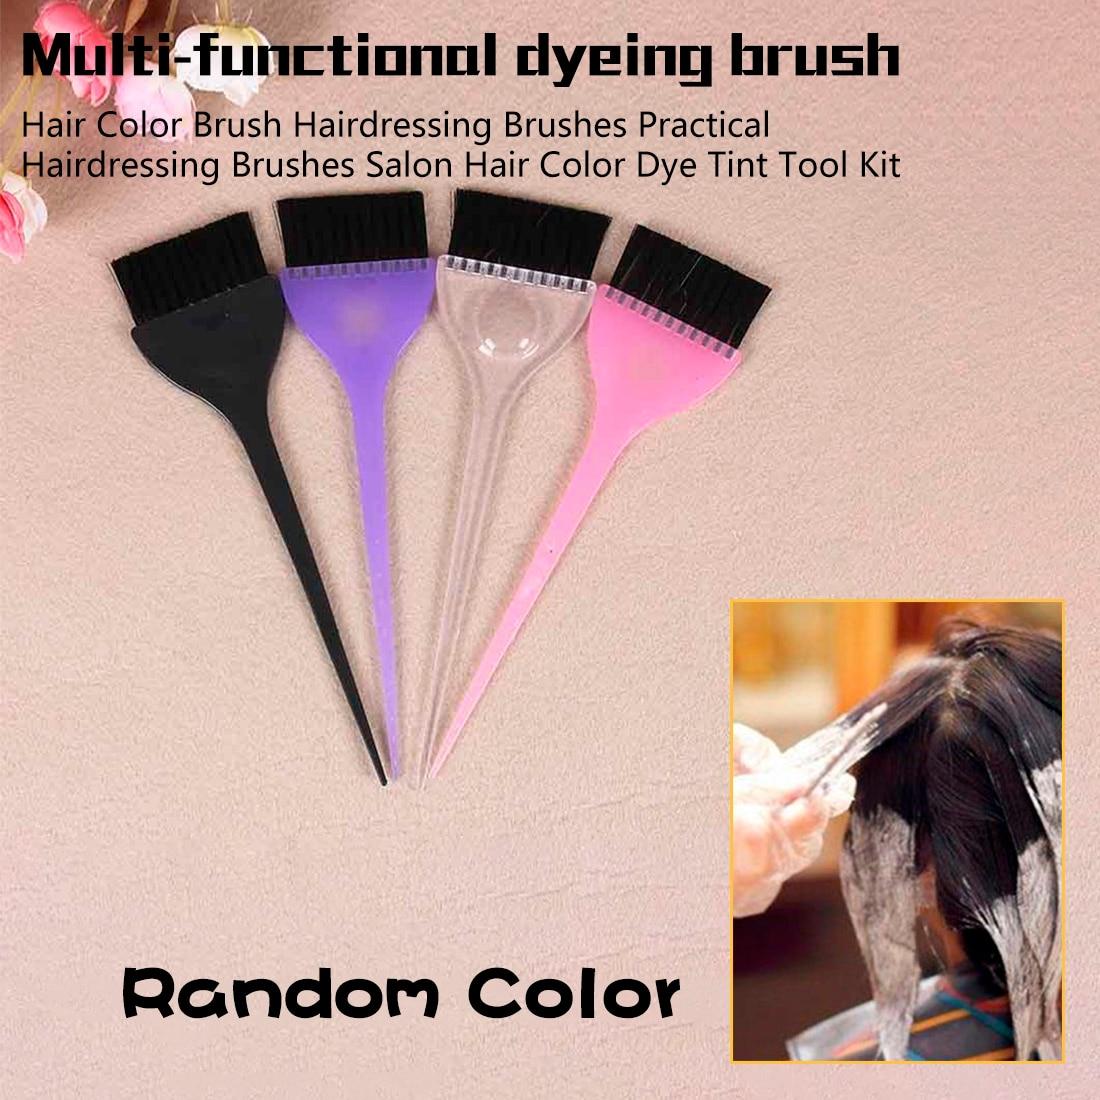 Black Hairdressing Brushes Salon Hair Color Dye Tint Tool Kit New Hair Brush Hair Accessories Drop Shipping